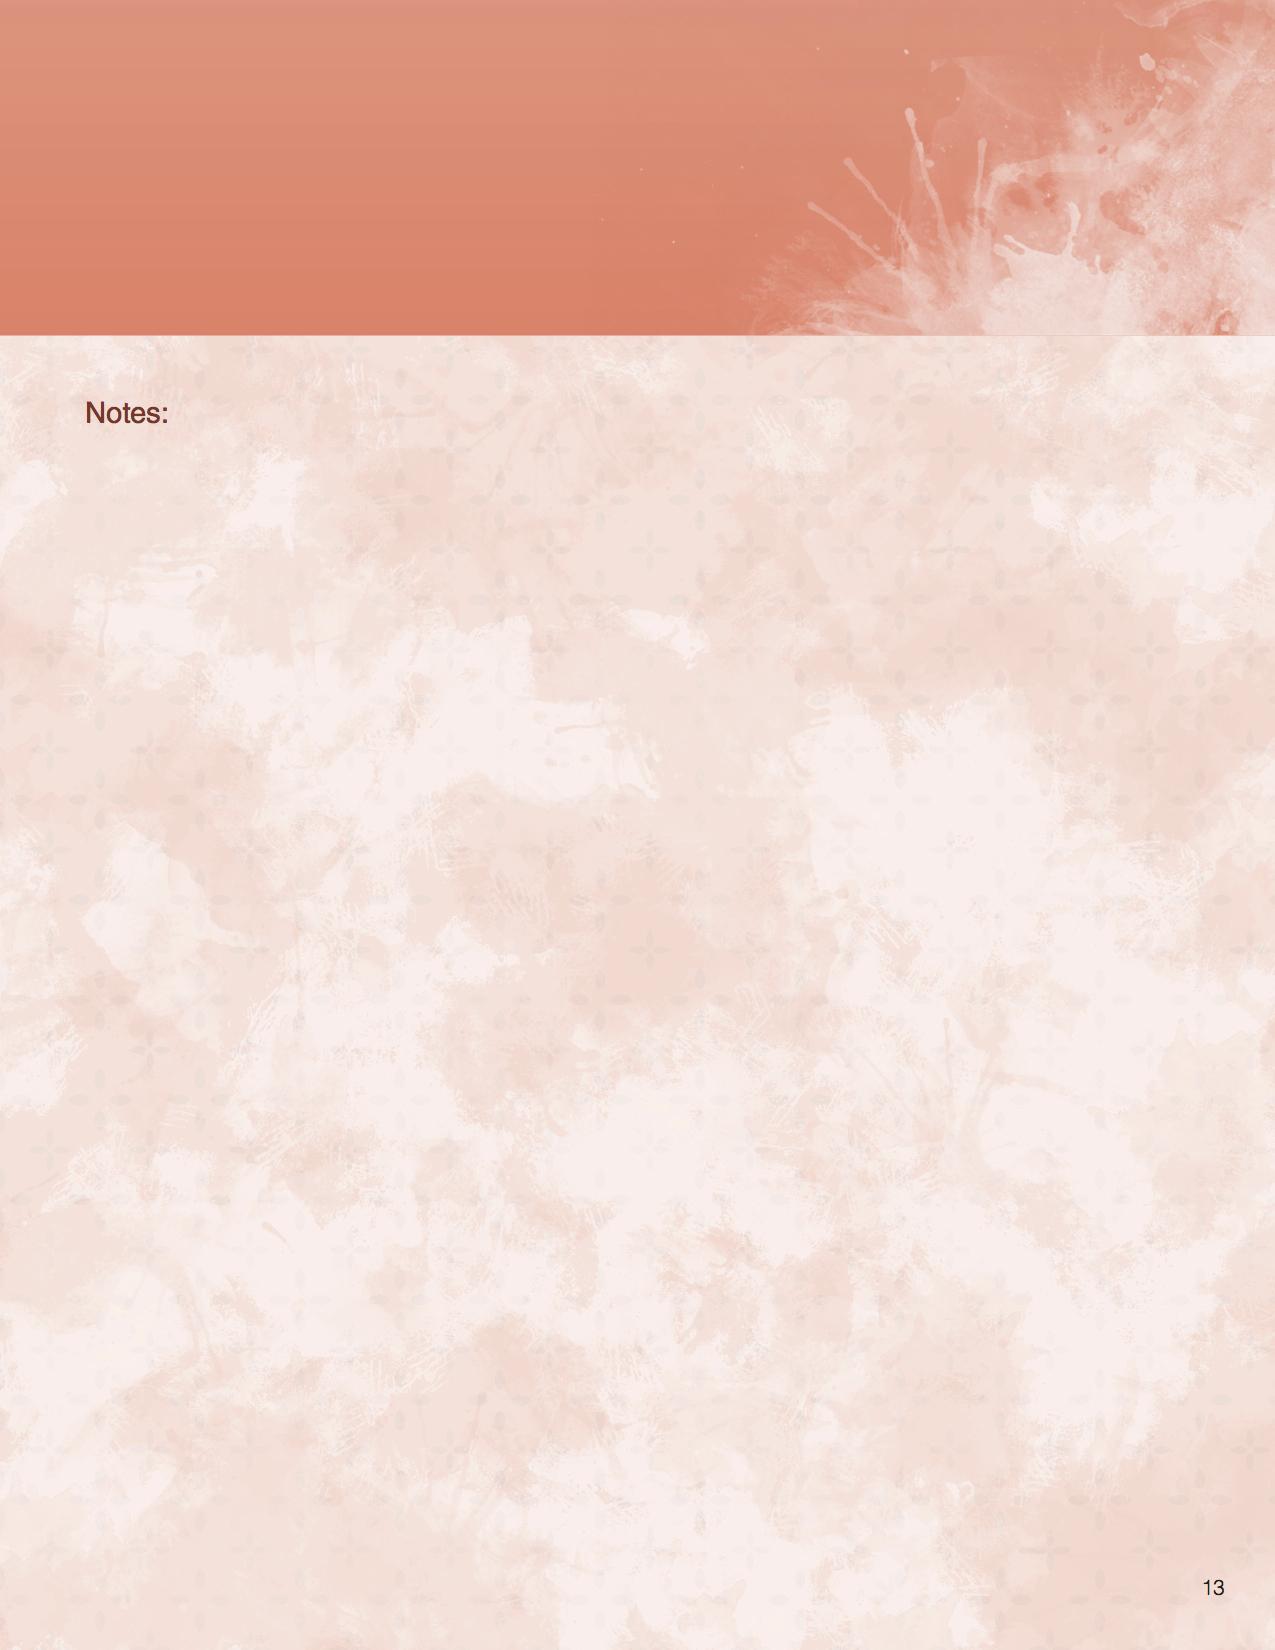 avanttot-print (2) (dragged) 15.jpeg